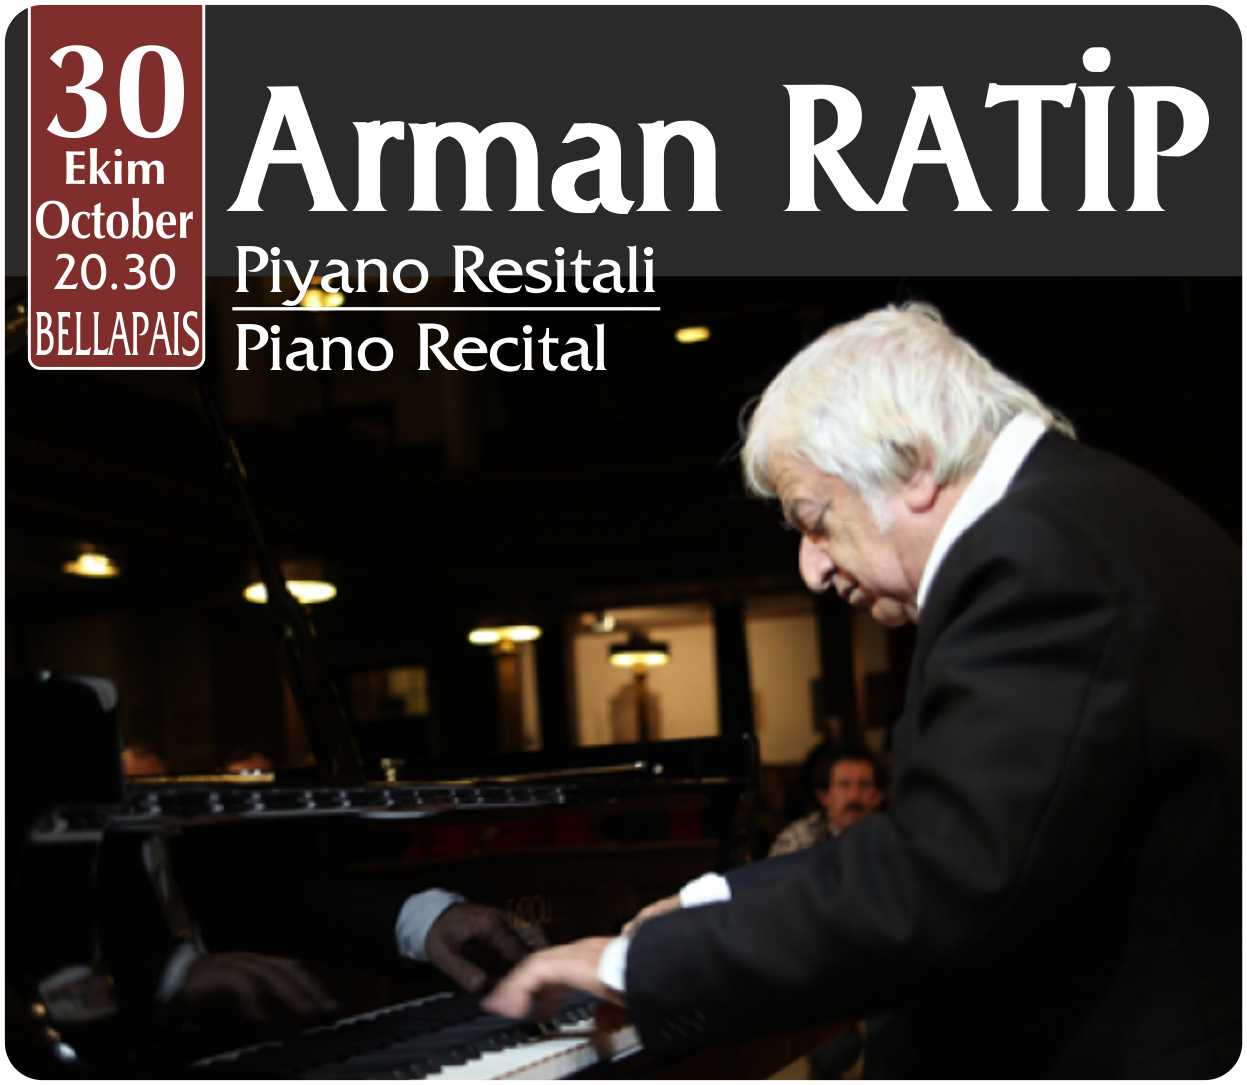 Arman RATİP - Piyano Resitali / Piano Recital